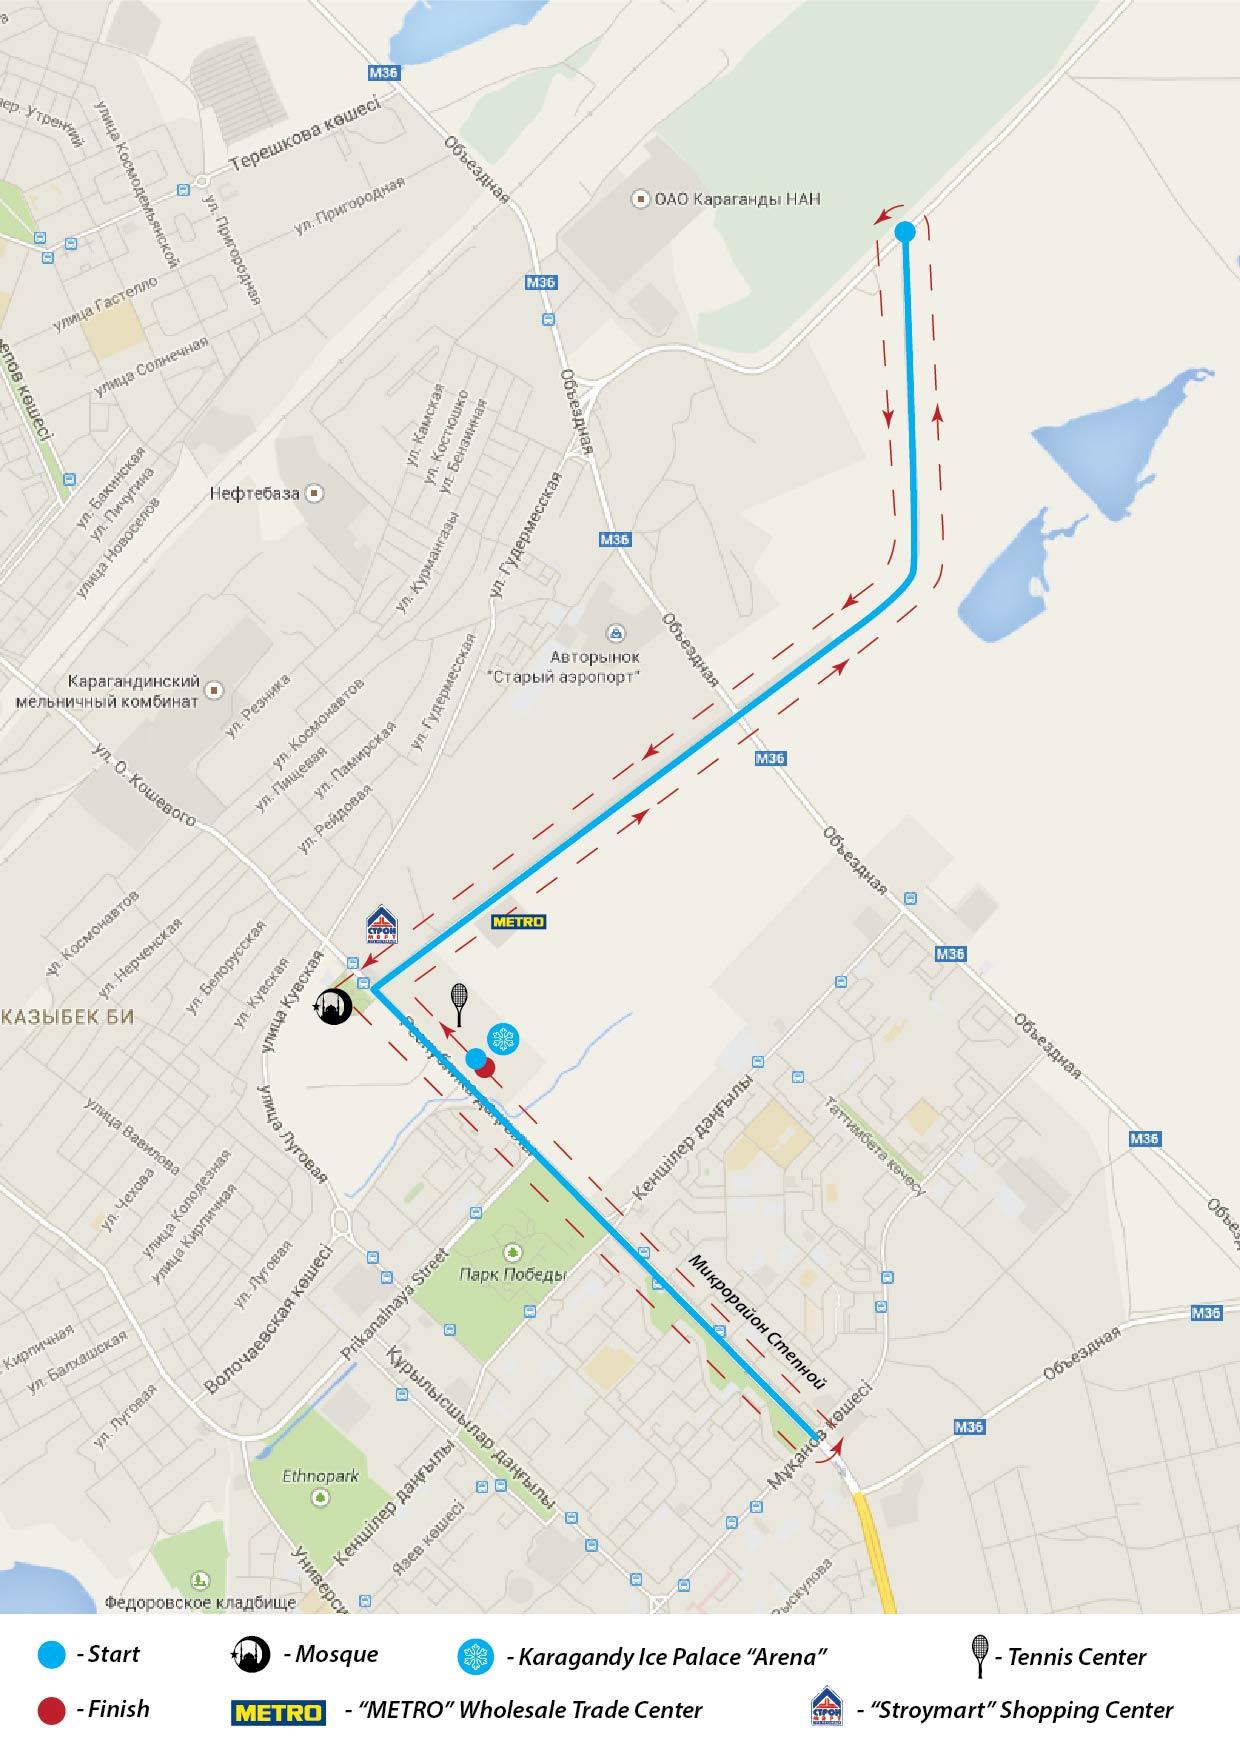 http://velolive.com/uploads/posts/2014-04/1397843319_00_asian-cycling-championships-2014-velolive.jpg